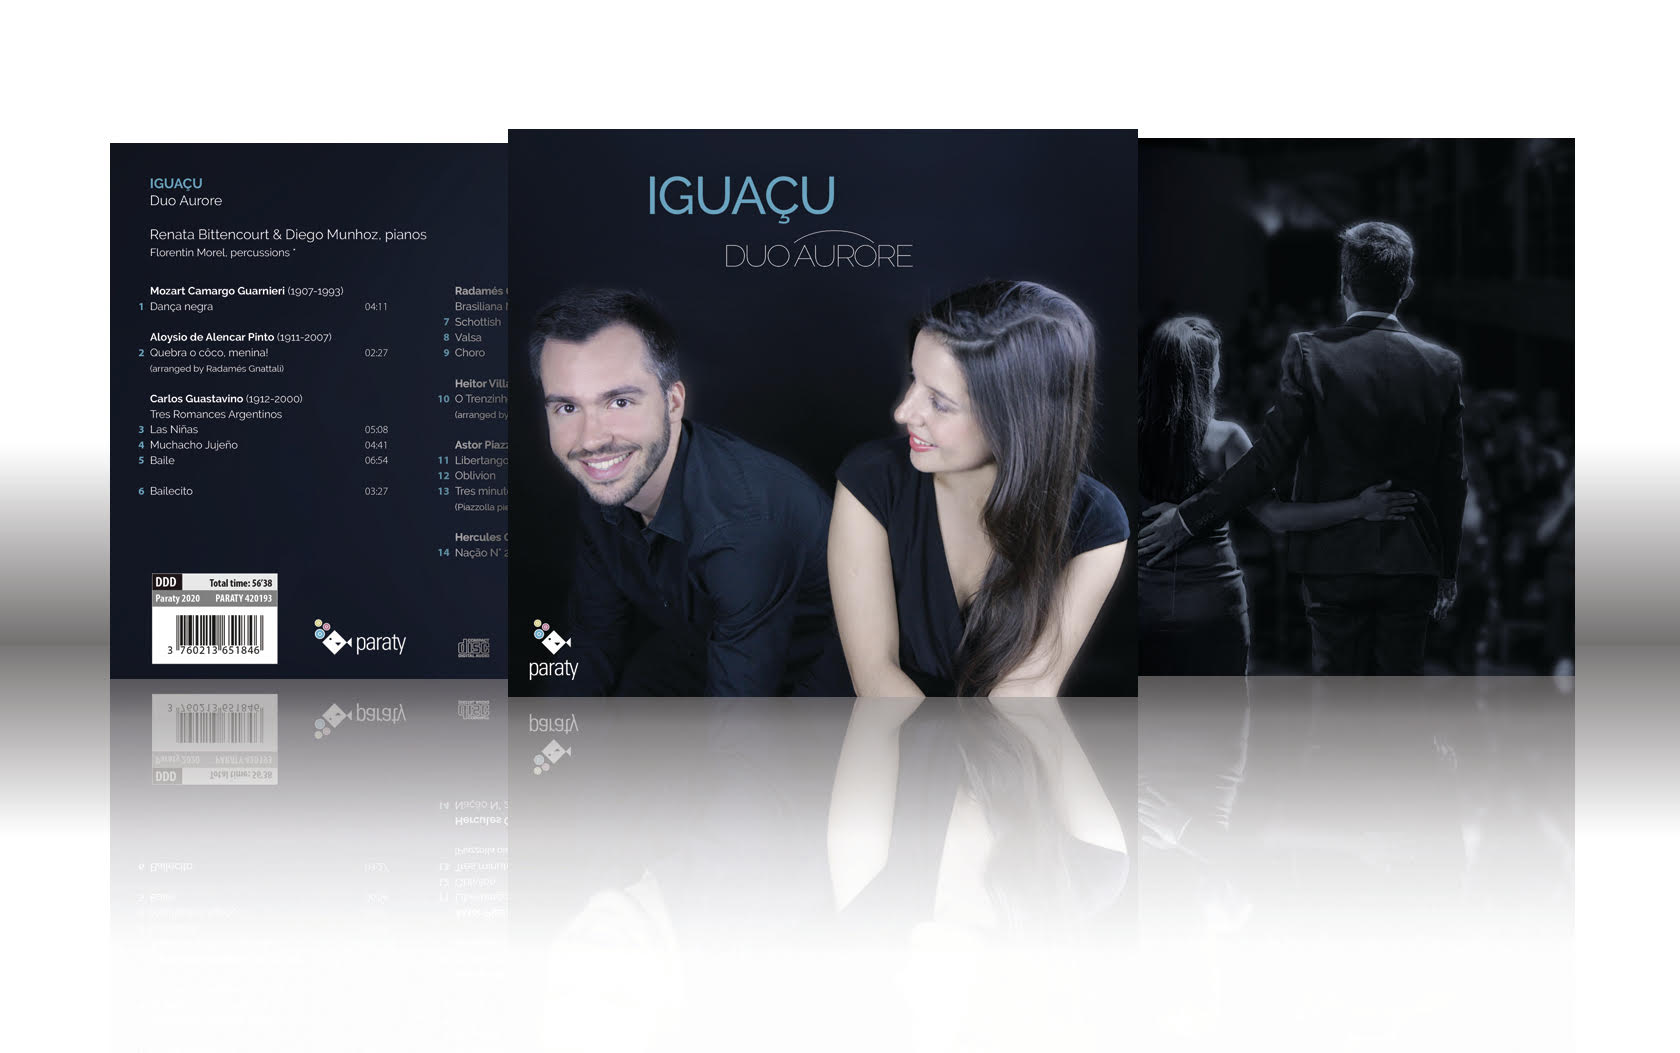 Sortie le 15 mai du CD Iguaçu | duo Aurore